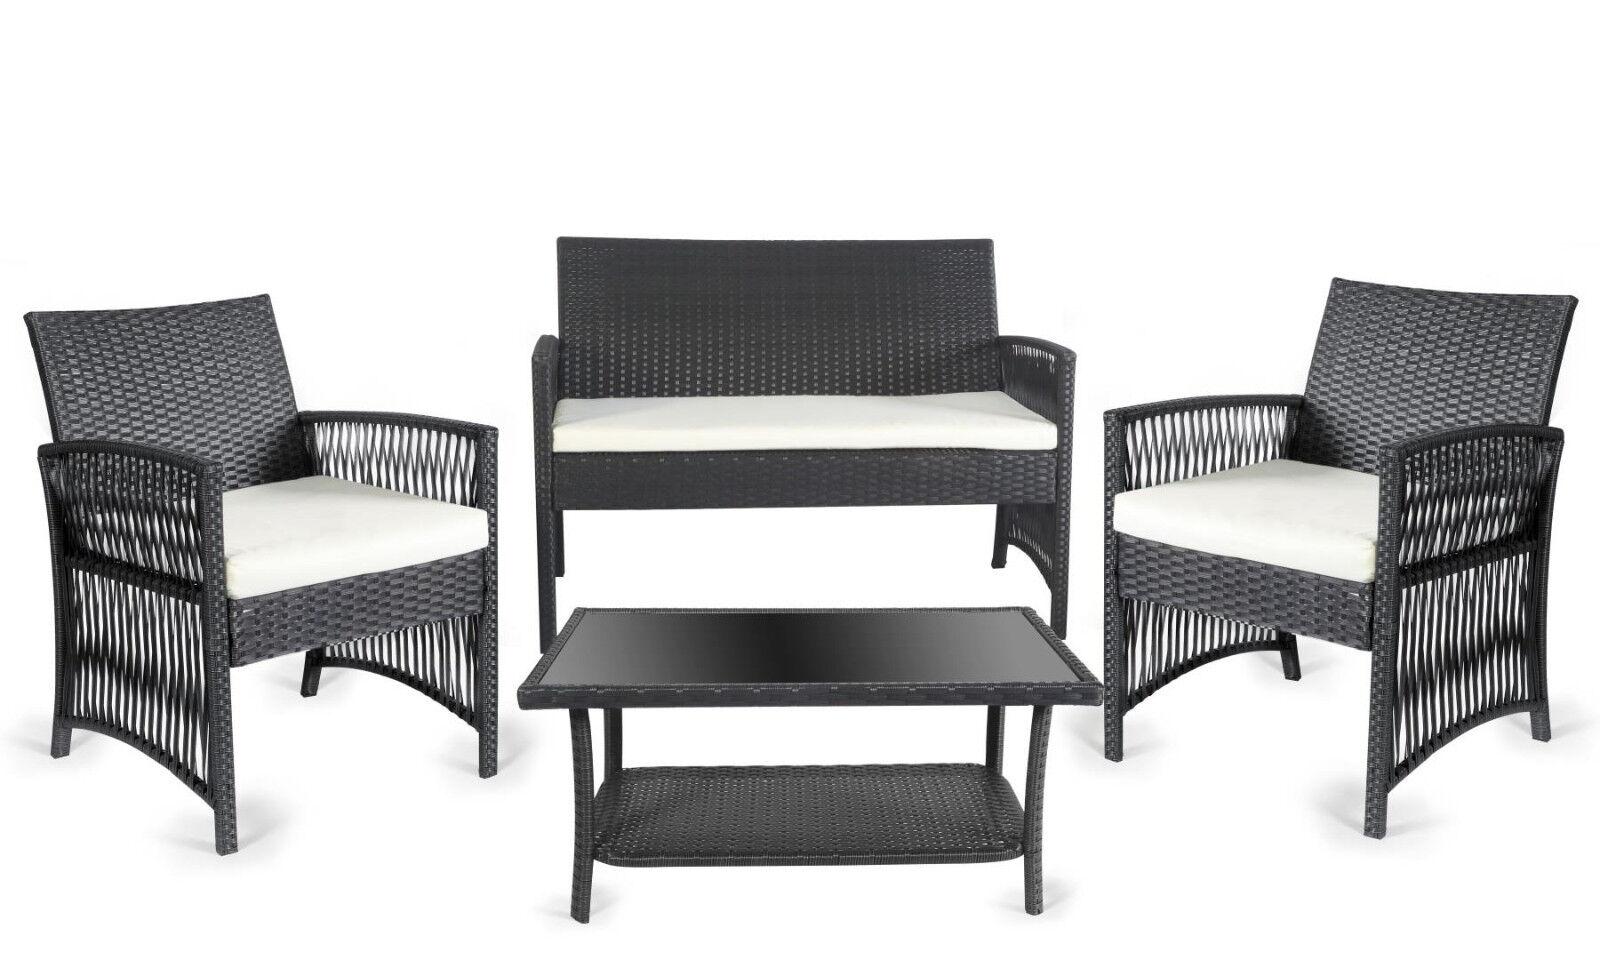 Merxx Gartenmöbel-Set 1 Trivero 7-teilig, Aluminium/Textil, Graphit ...